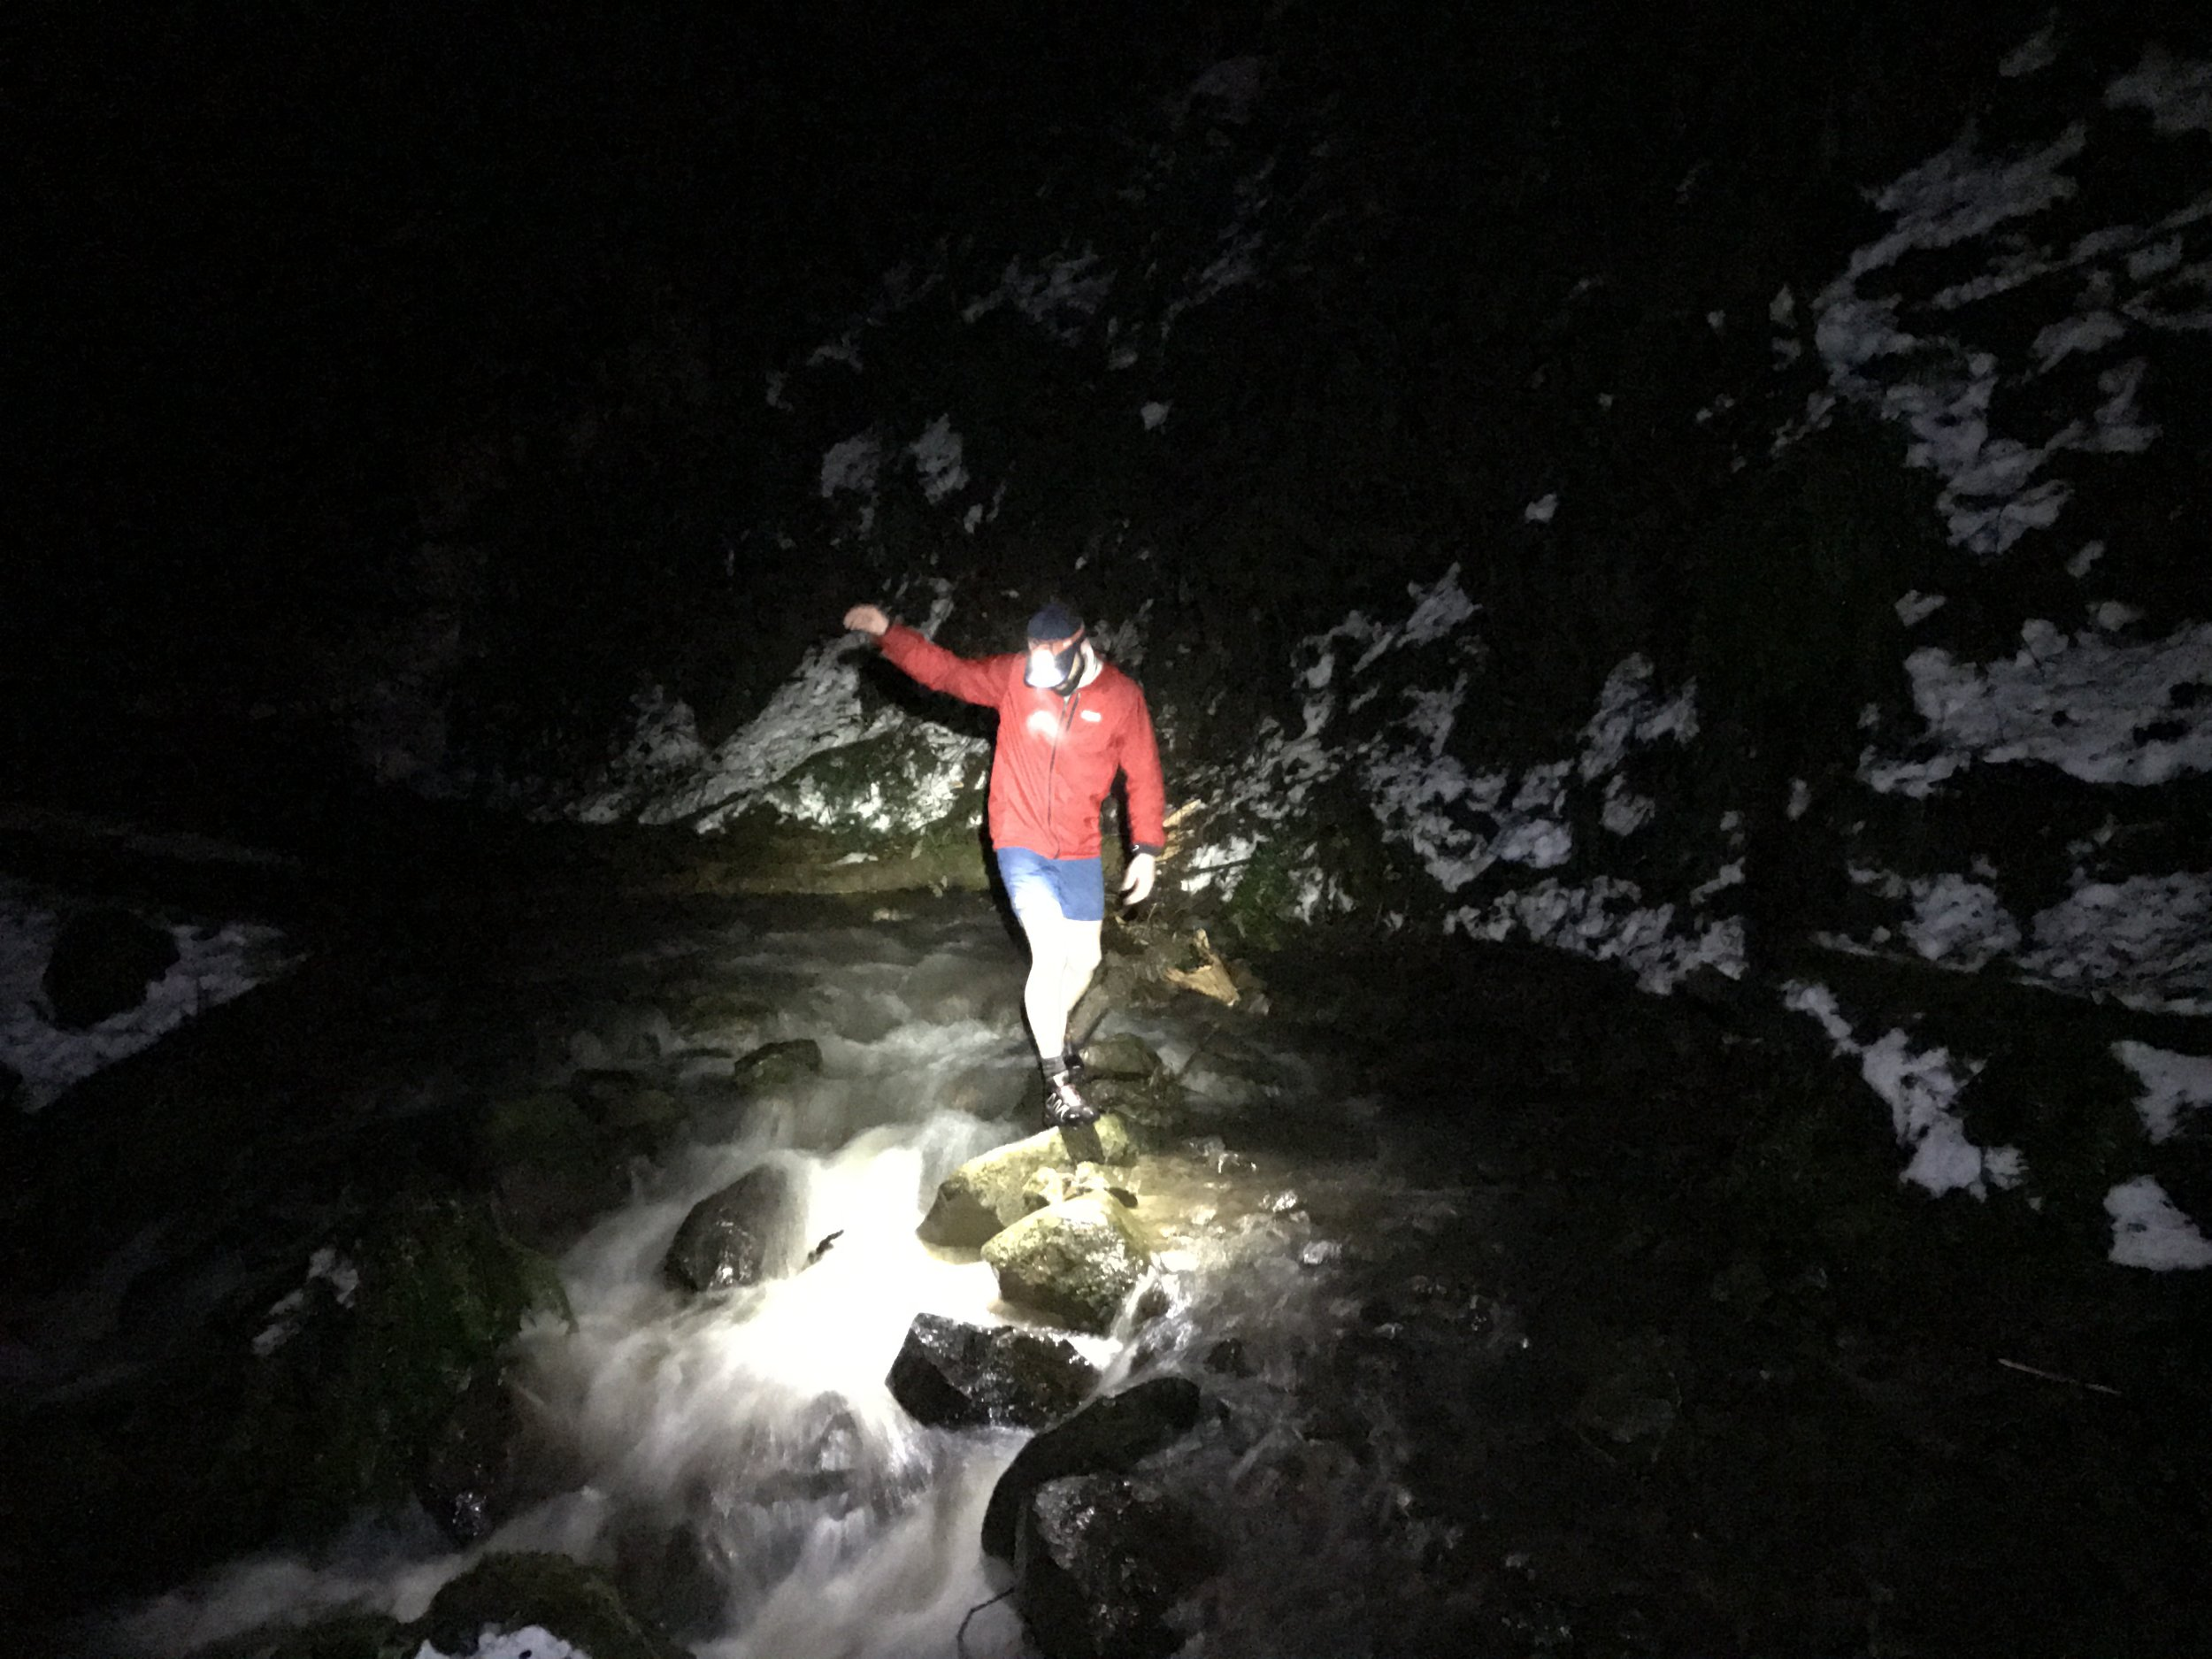 Jordan navigating the treacherous waters of Forest Park - North Portland